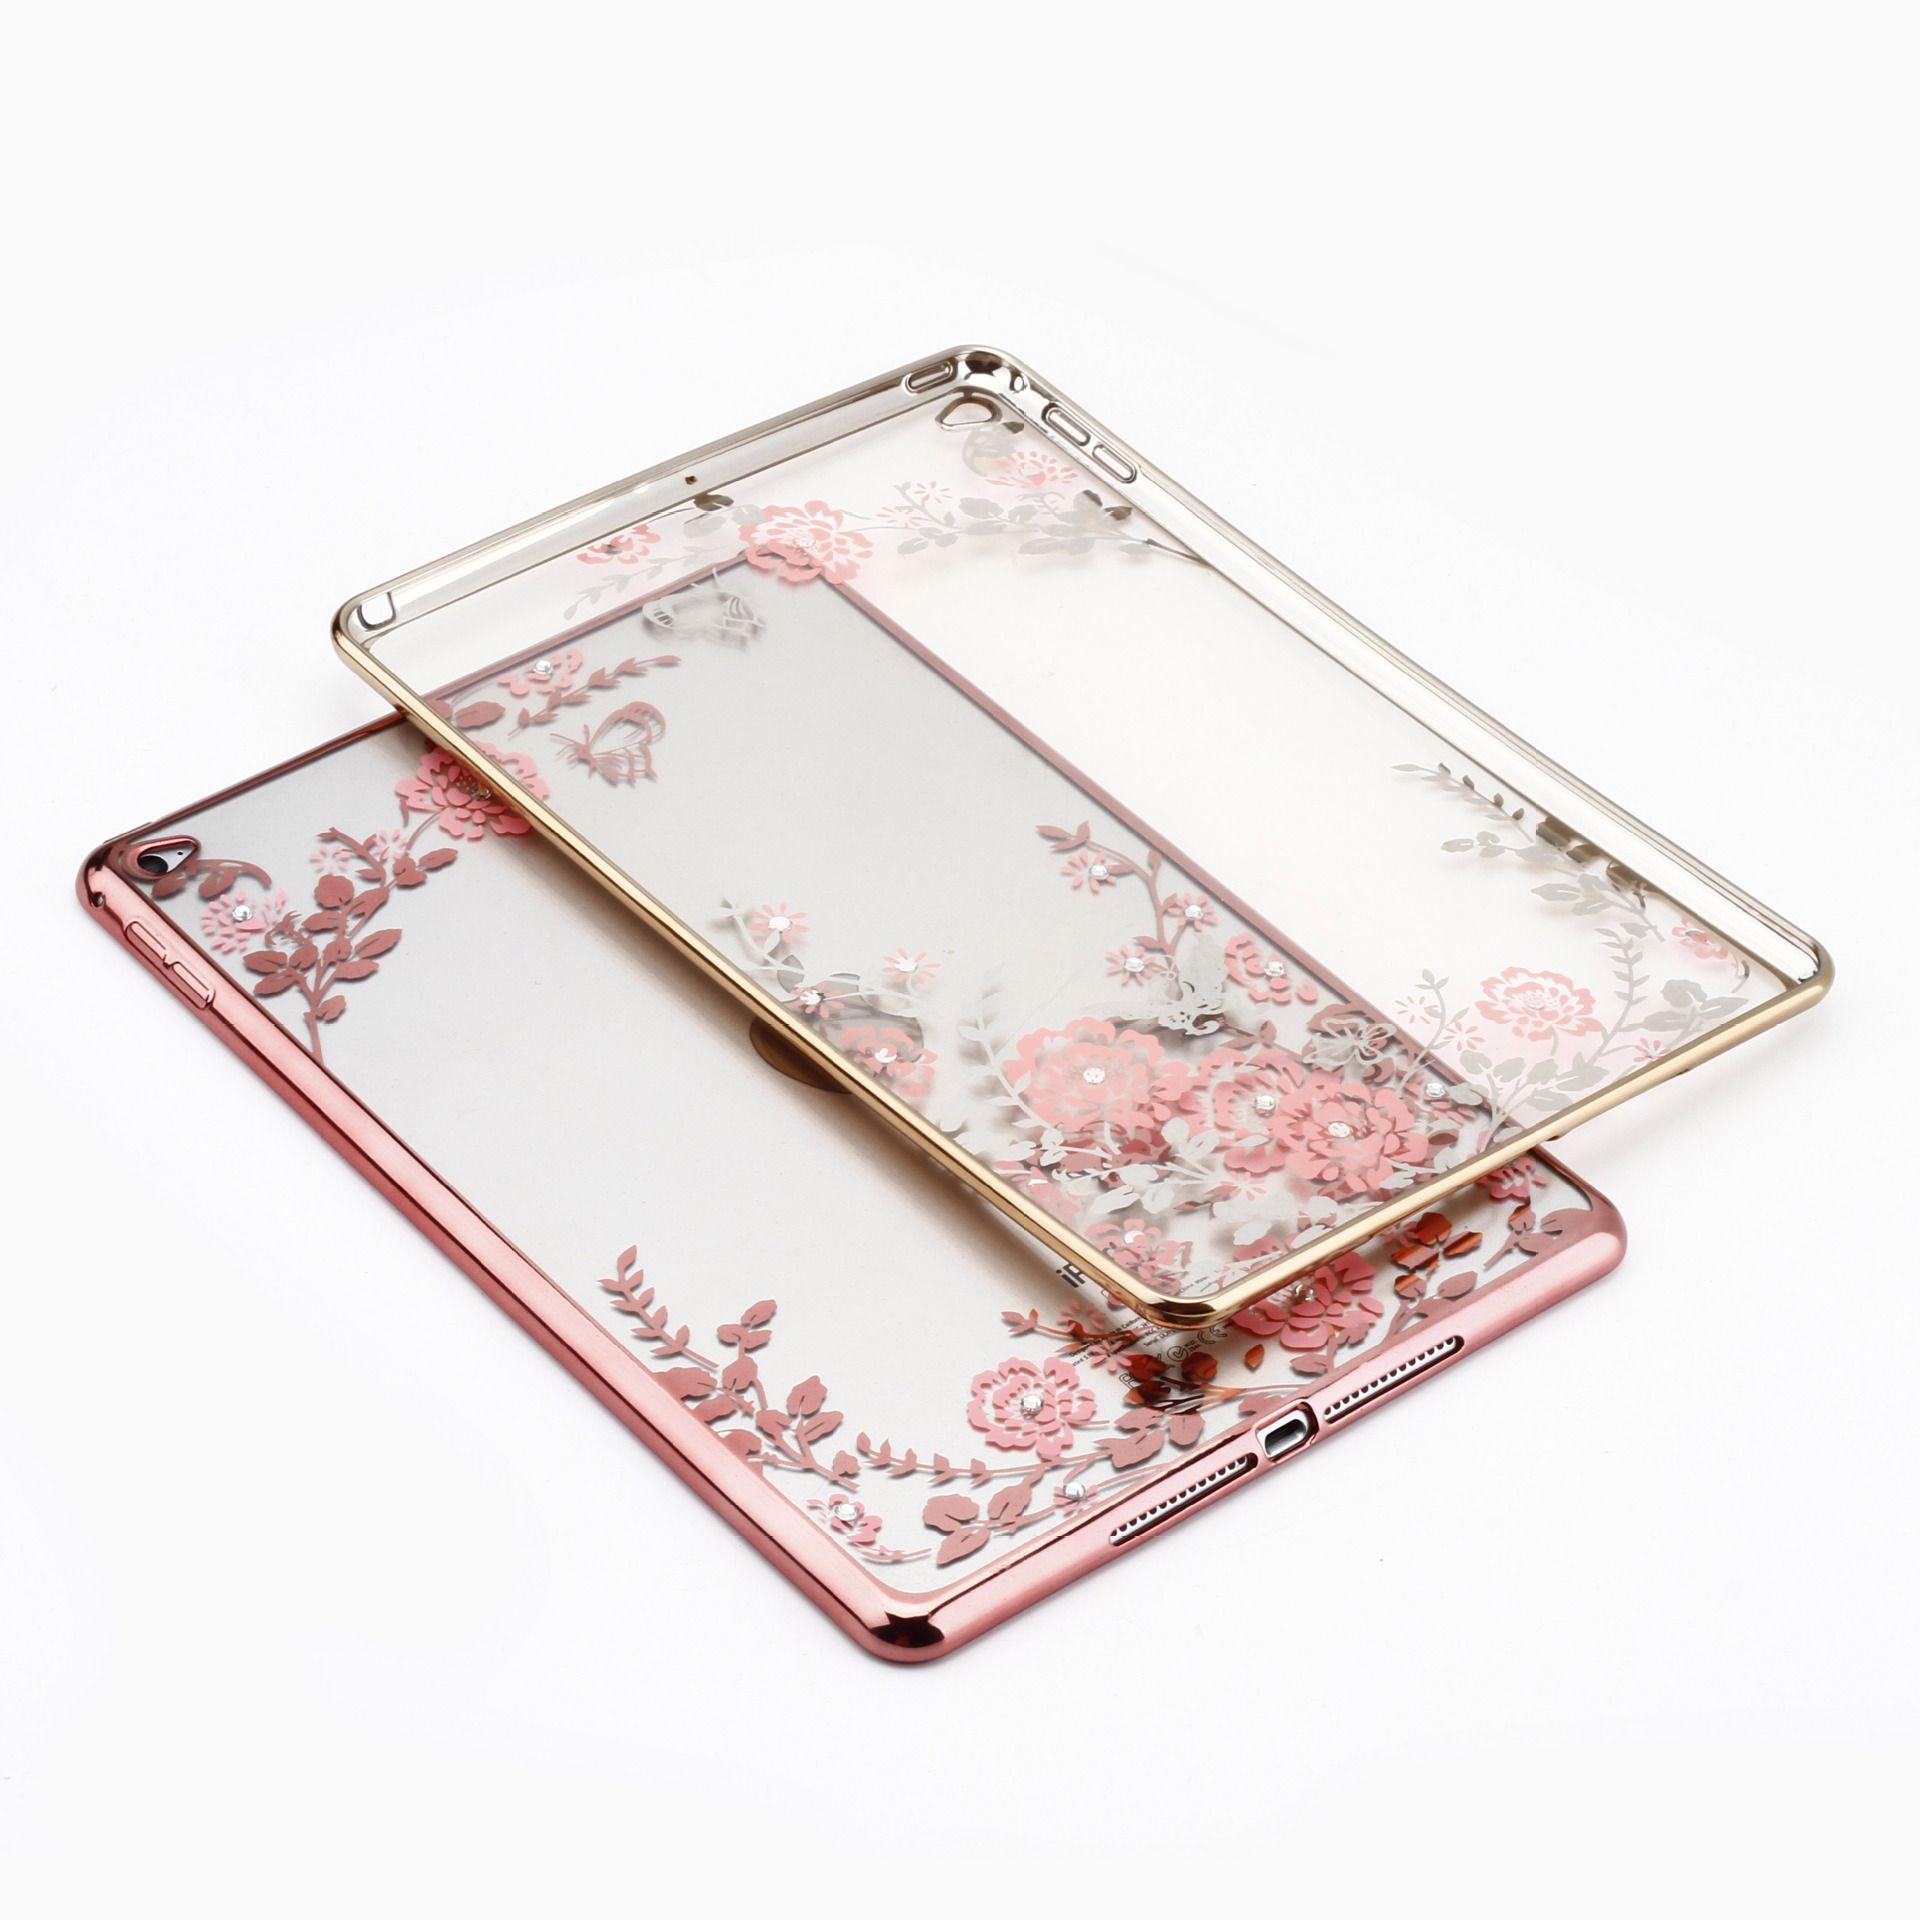 Diamond Secret Garden Flower para iPad Mini 2 3 4 Para iPad air1 air2 Pro Marco de galvanoplastia Transparen Soft TPU Tablet Case Capa